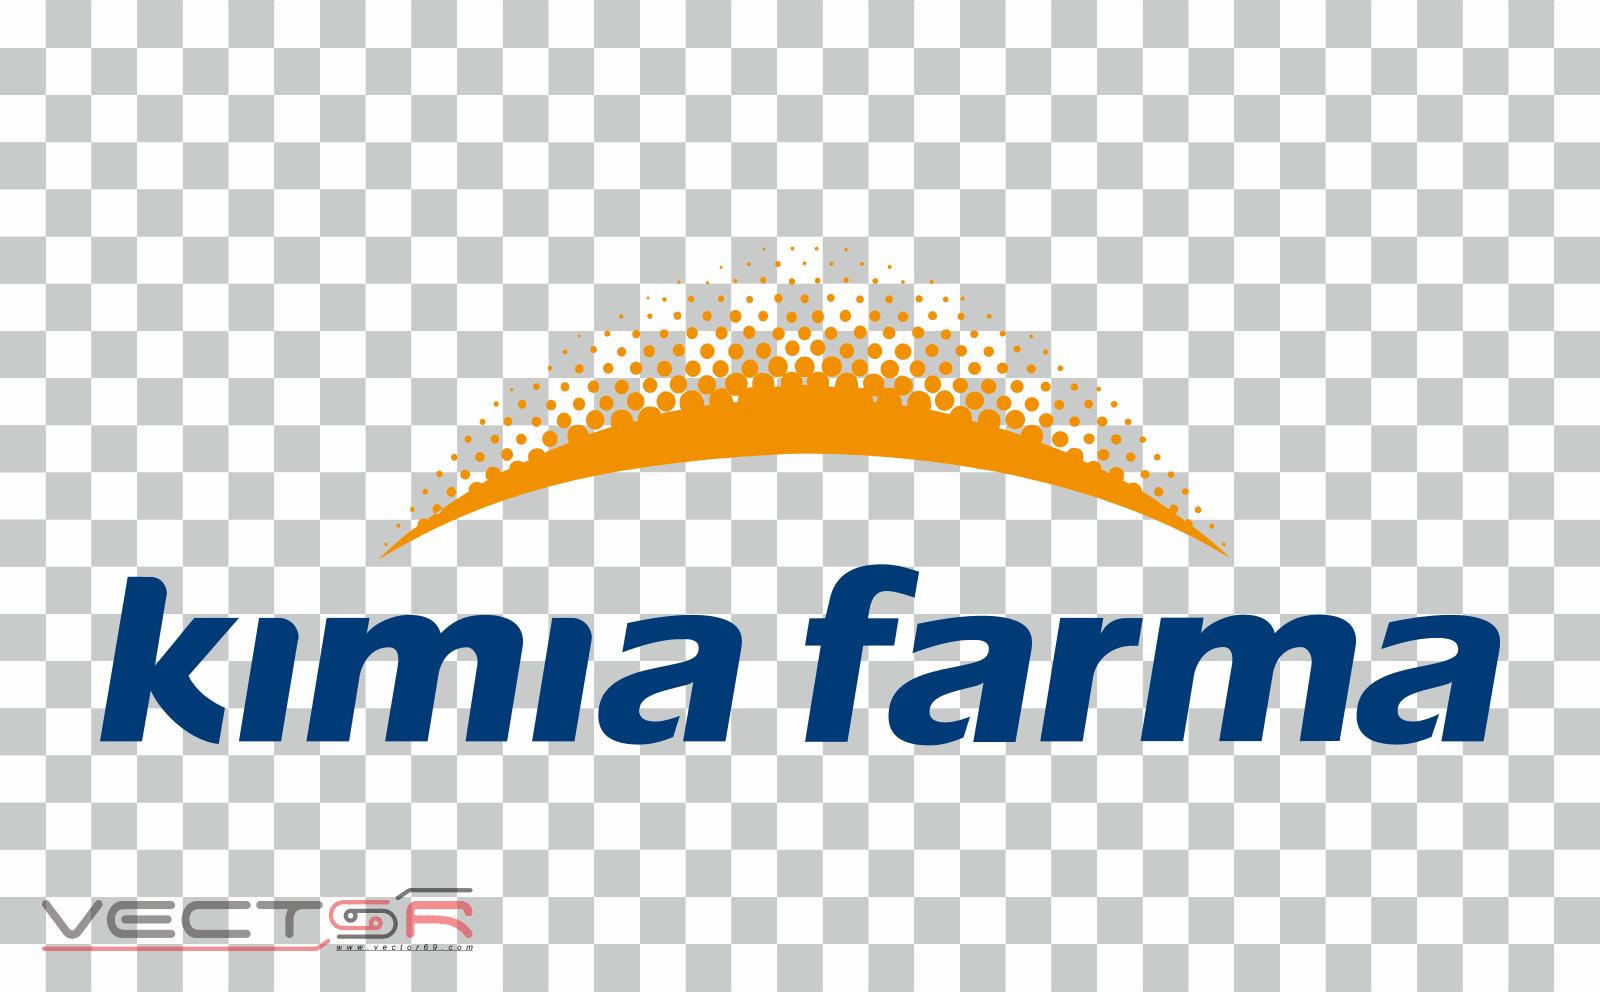 Kimia Farma (2004) Logo - Download .PNG (Portable Network Graphics) Transparent Images